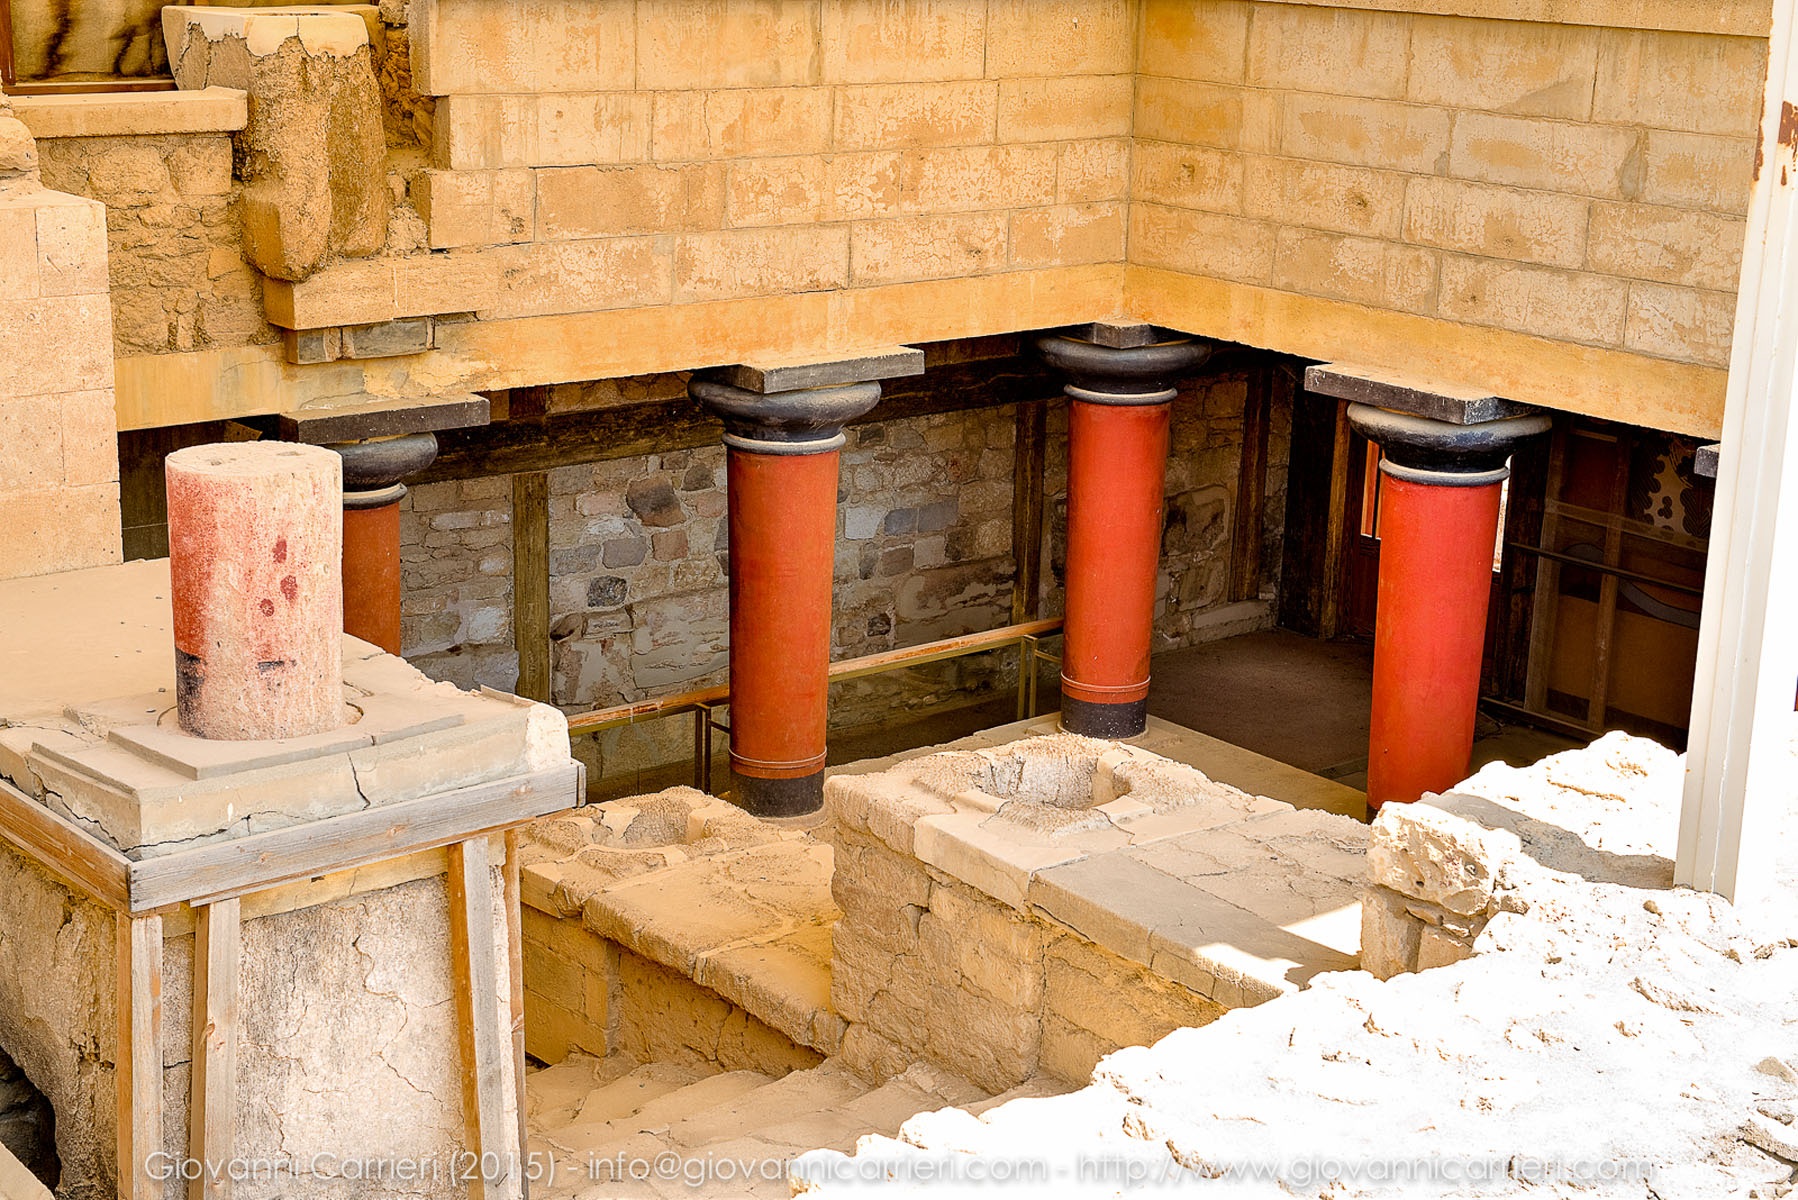 Details of Knossos palace